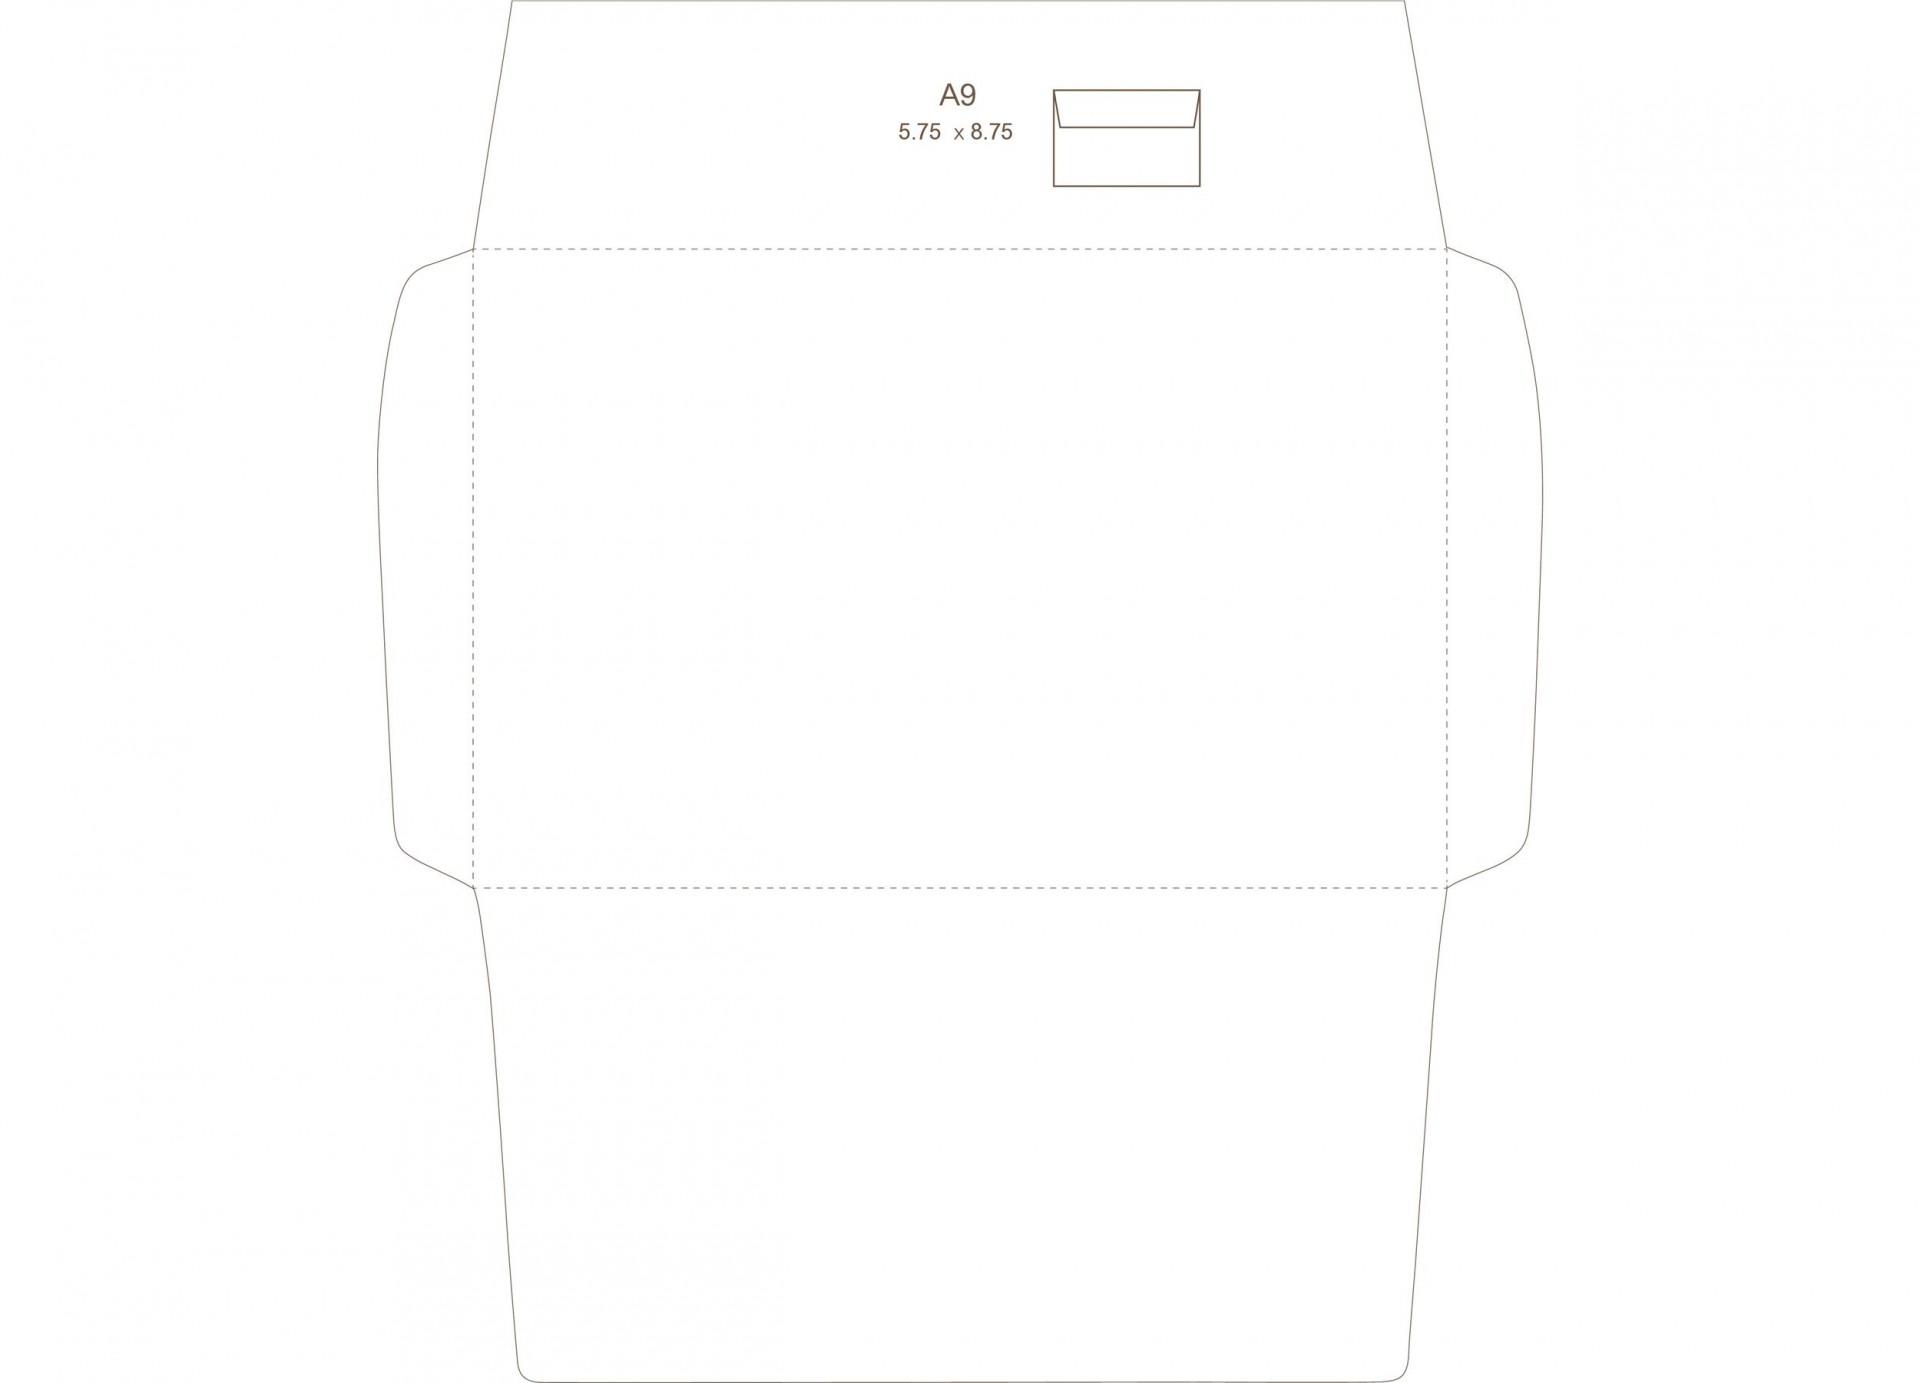 008 Unique 5x7 Envelope Template Word Inspiration  Microsoft Free1920